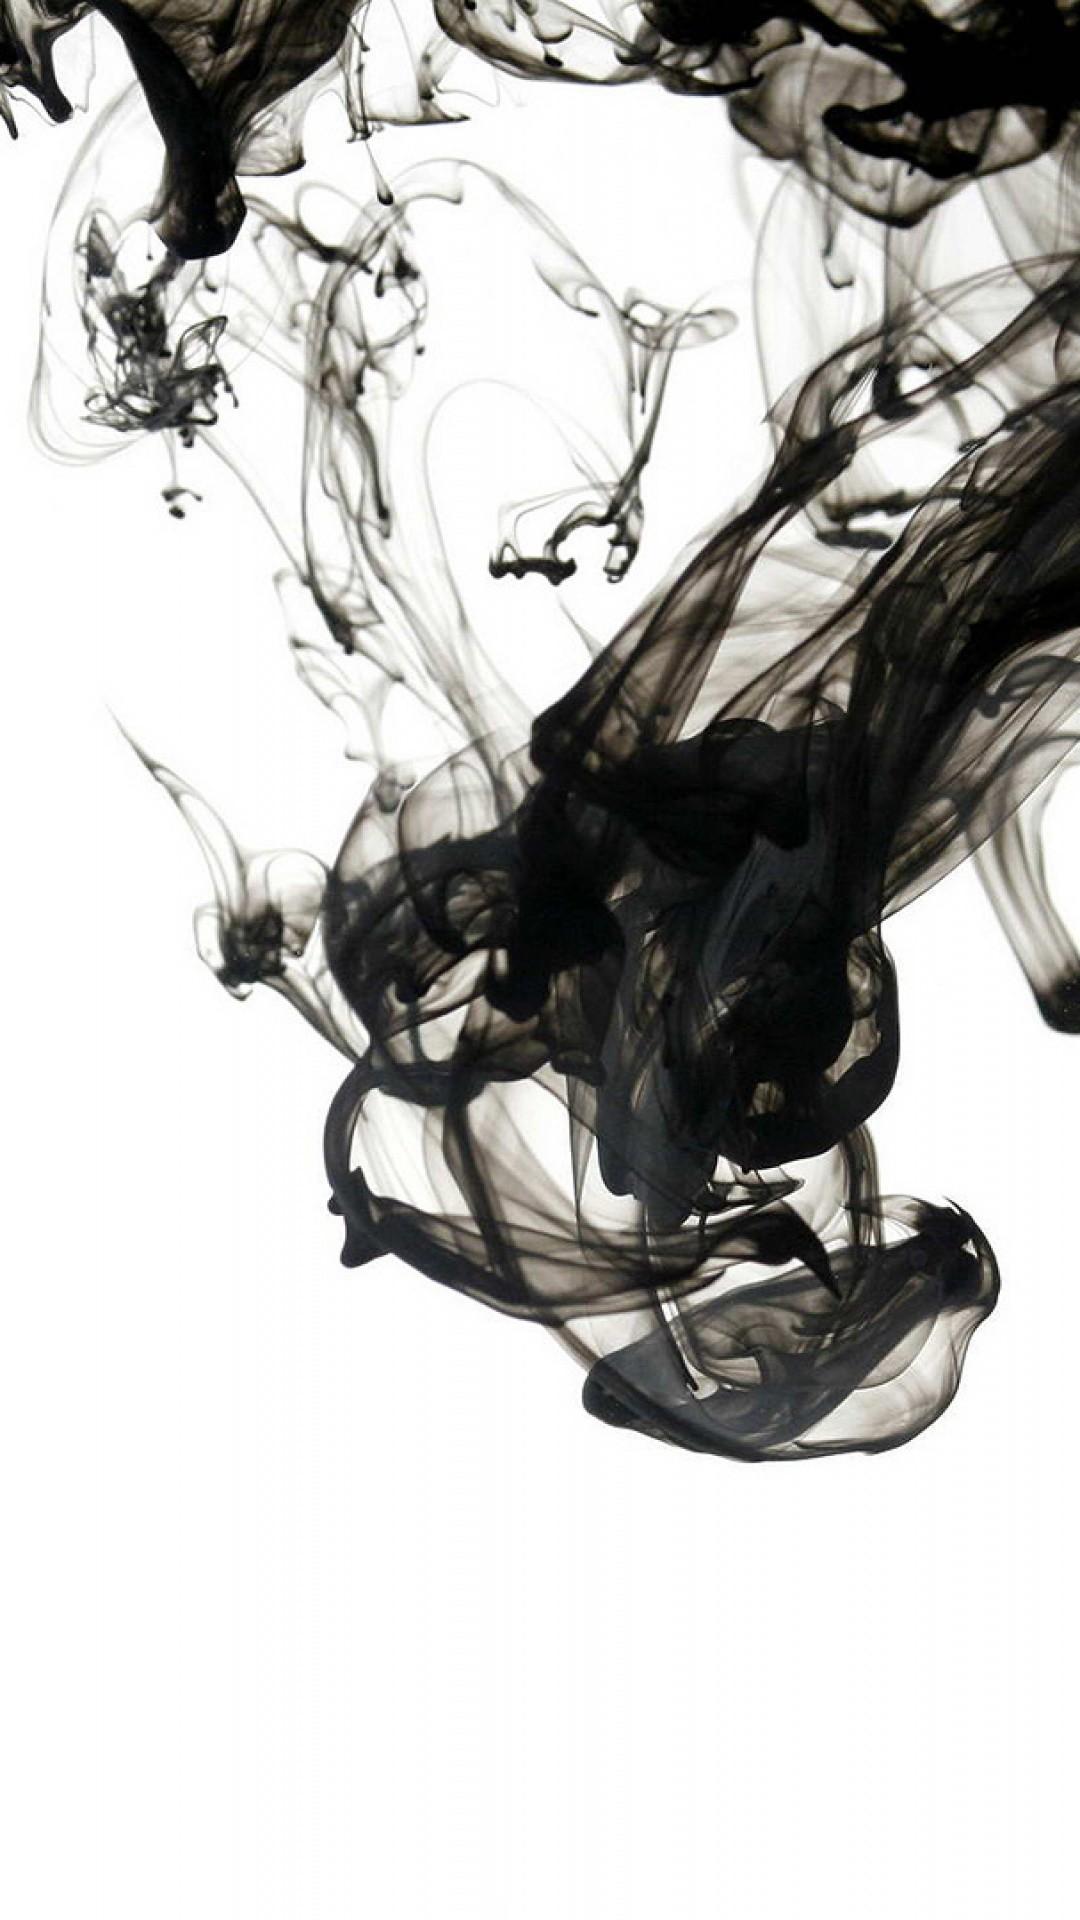 Black Smoke S4 Wallpaper | ID: 27258